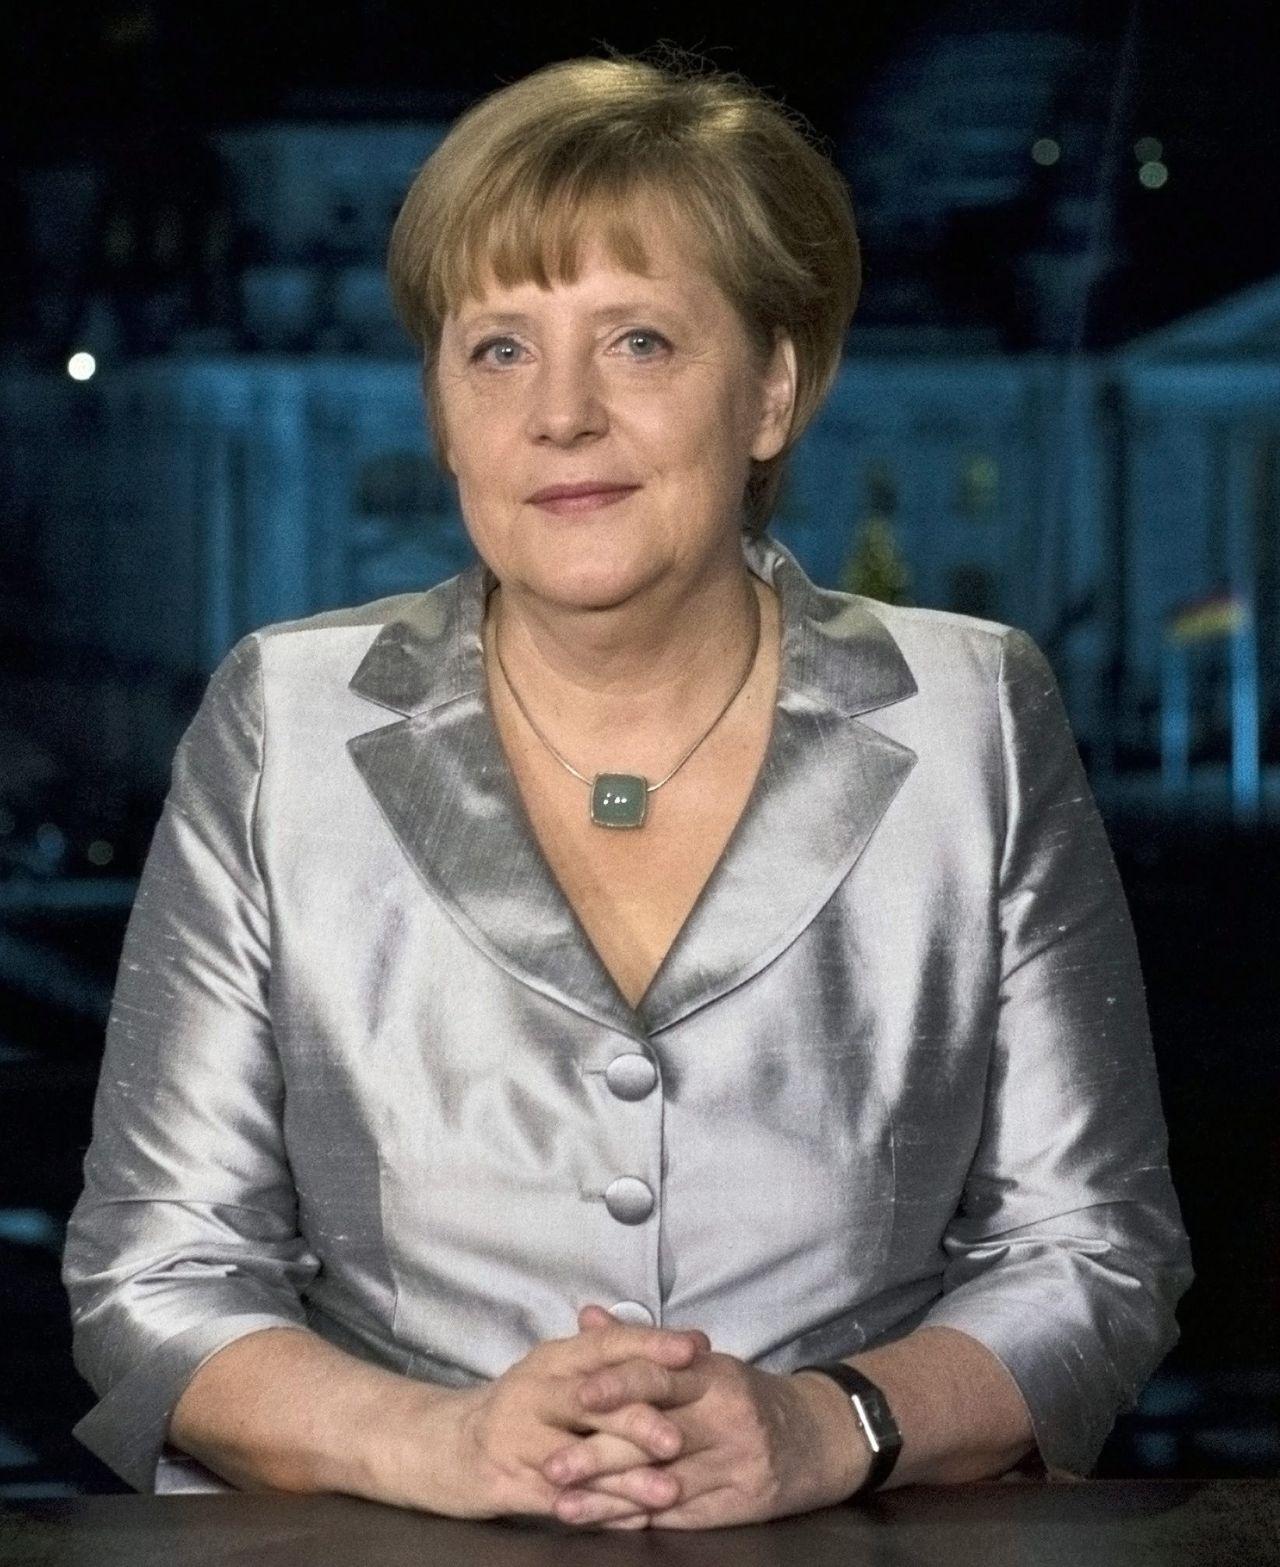 Bundeskanzlerin Angela Merkel bei Neujahrsansprache 2012